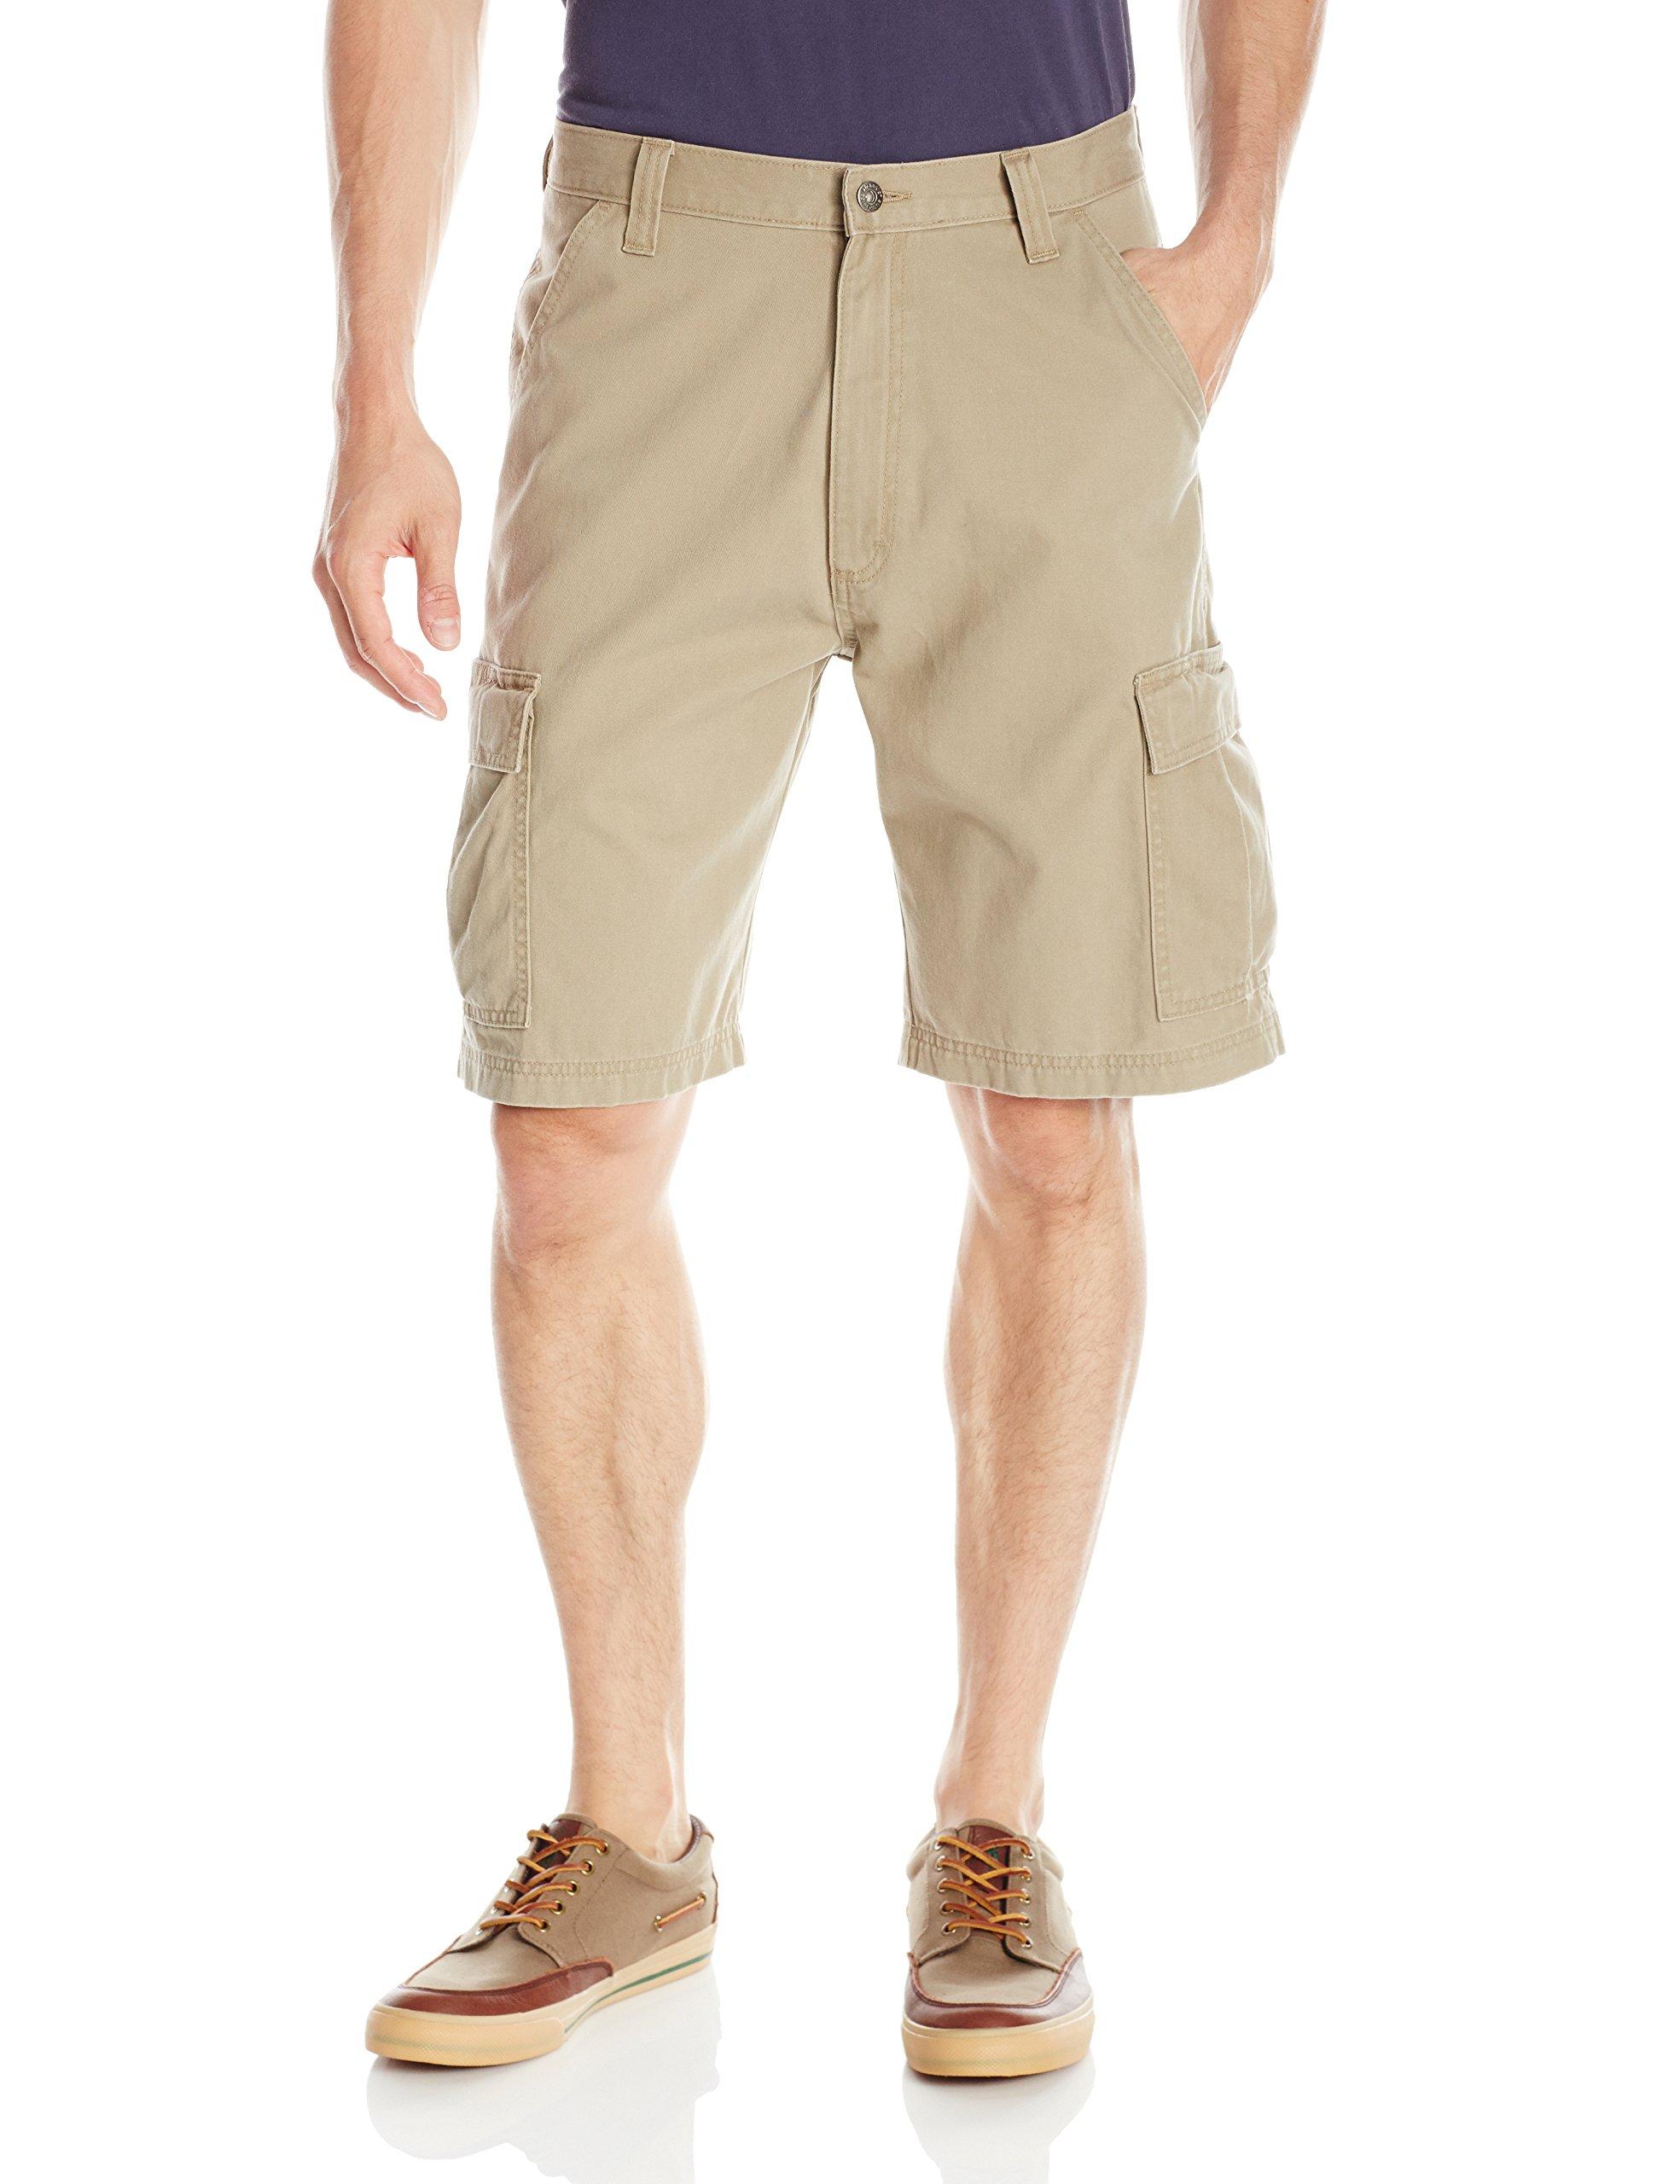 Wrangler Men's Authentics Classic Twill Cargo Short, British Khaki Twill, 36